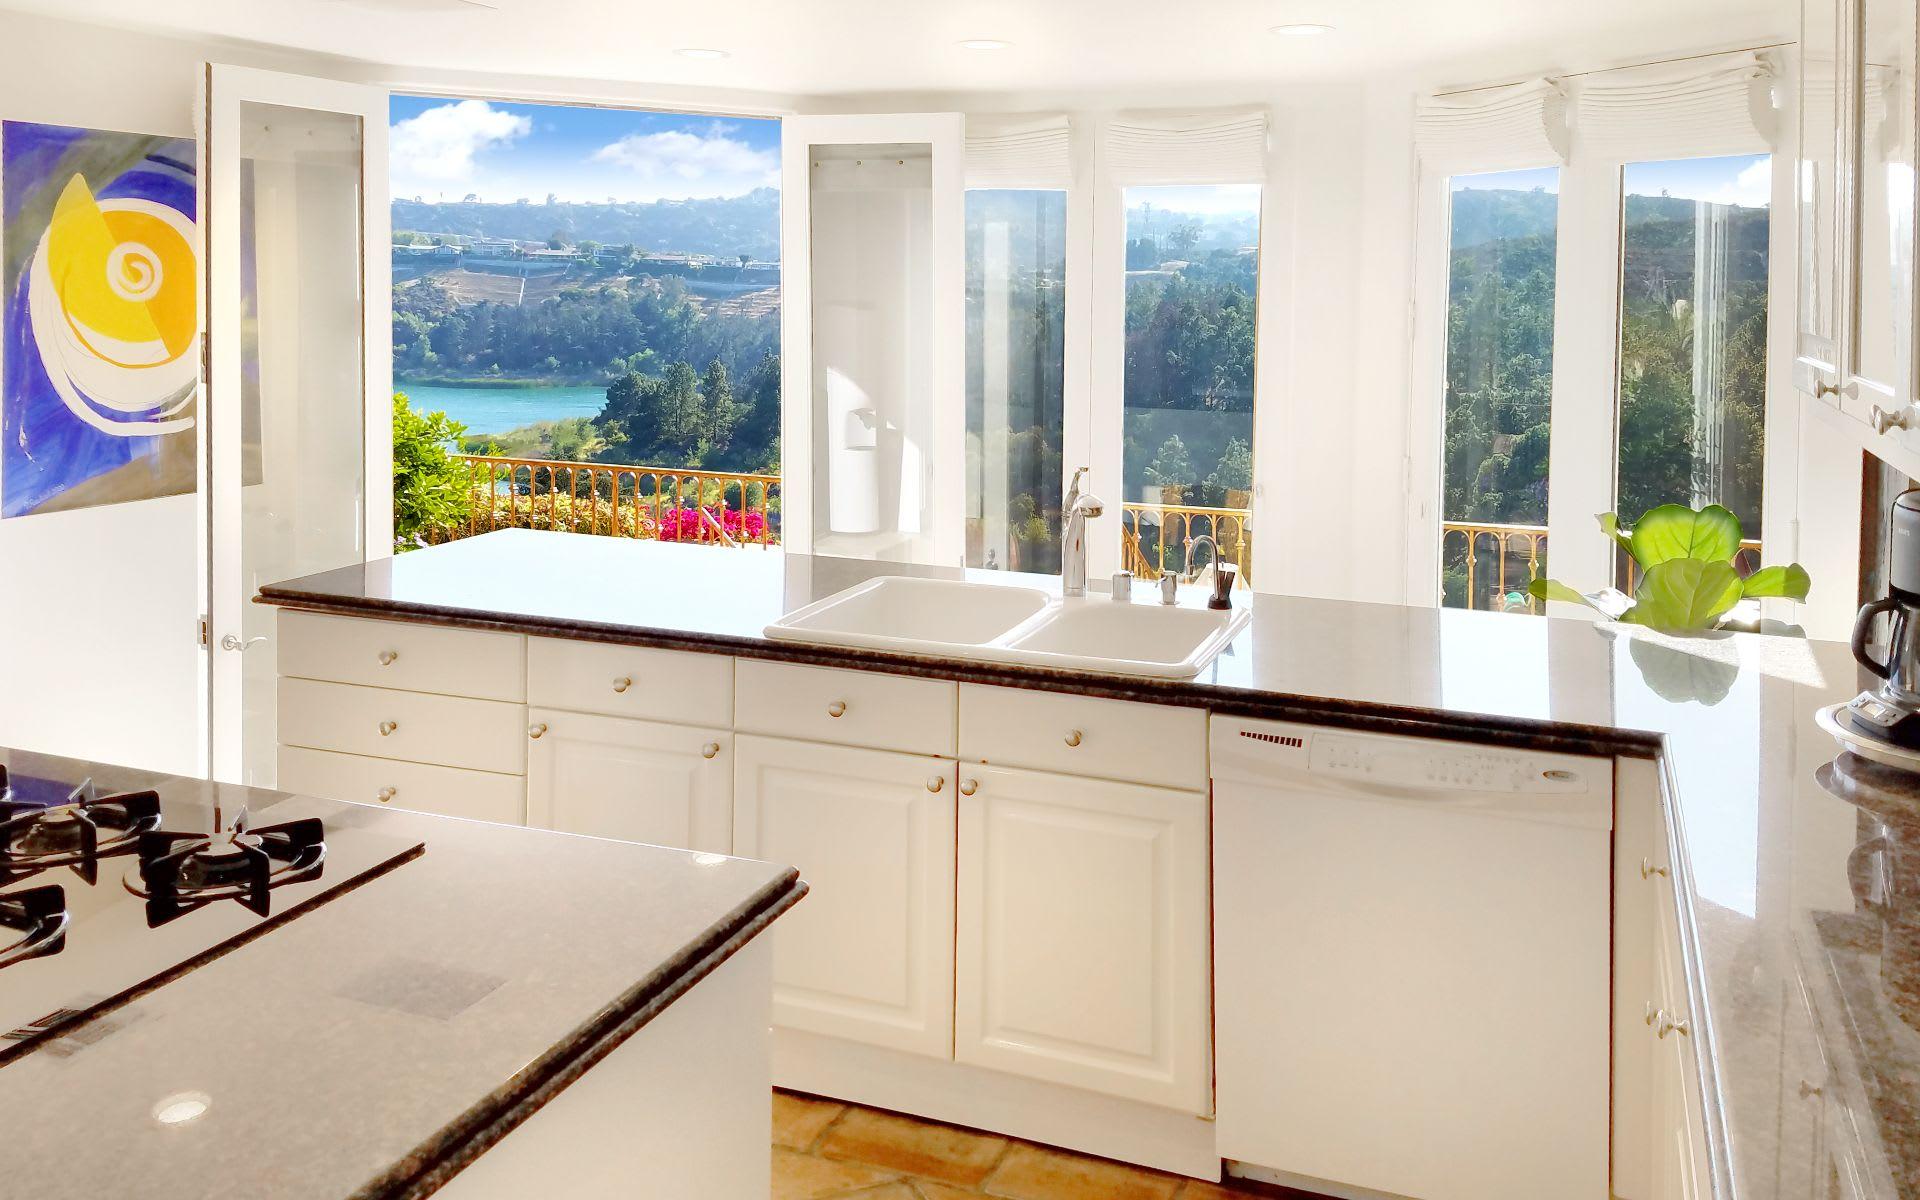 Additional photo for property listing at 6312 Arrowhead Pl 6312 Arrowhead Pl Los Angeles, 캘리포니아,90068 미국